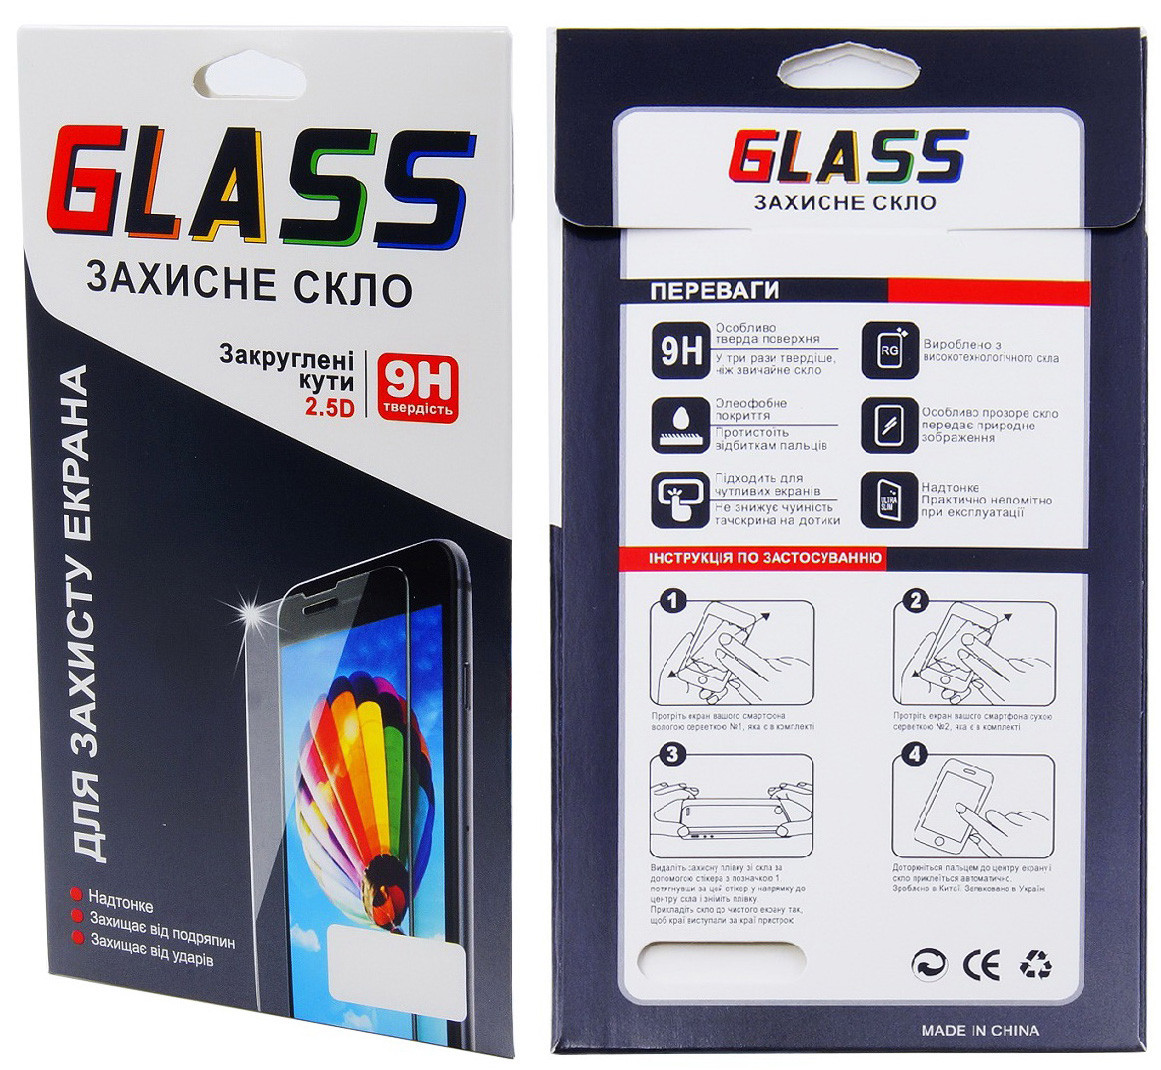 Скло захисне для телефону Sony Xperia E6533 Xperia Z3+, E6553, Xperia Z4, 2.5D, 0.3mm